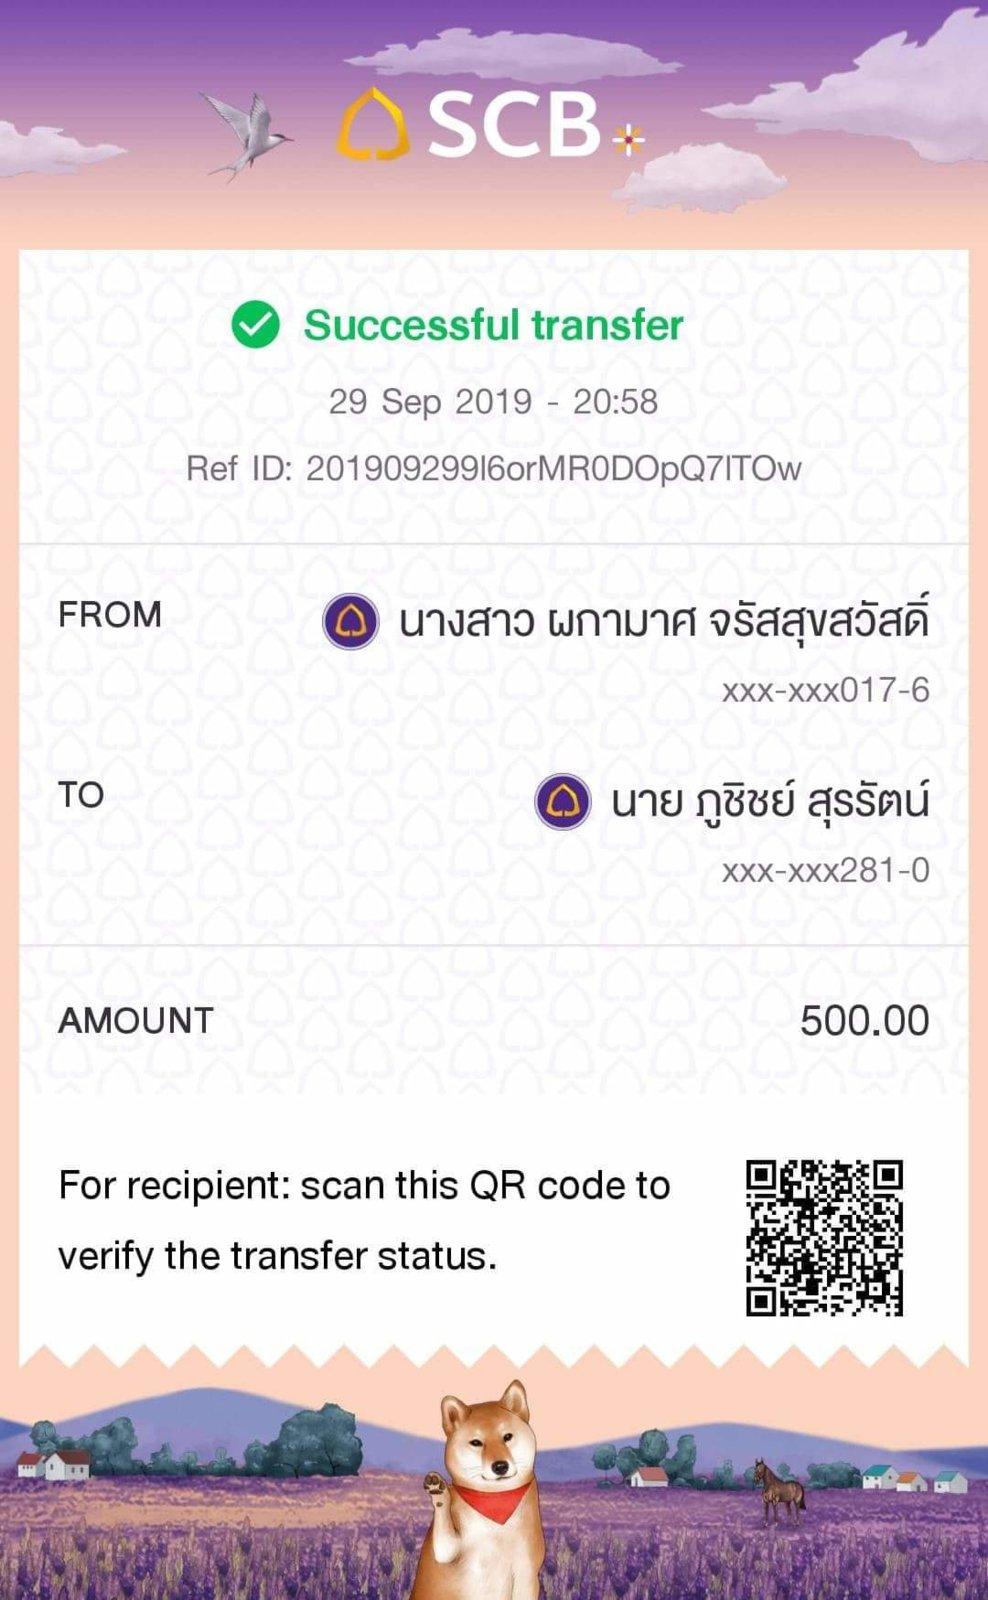 received_1766536486978400.jpeg